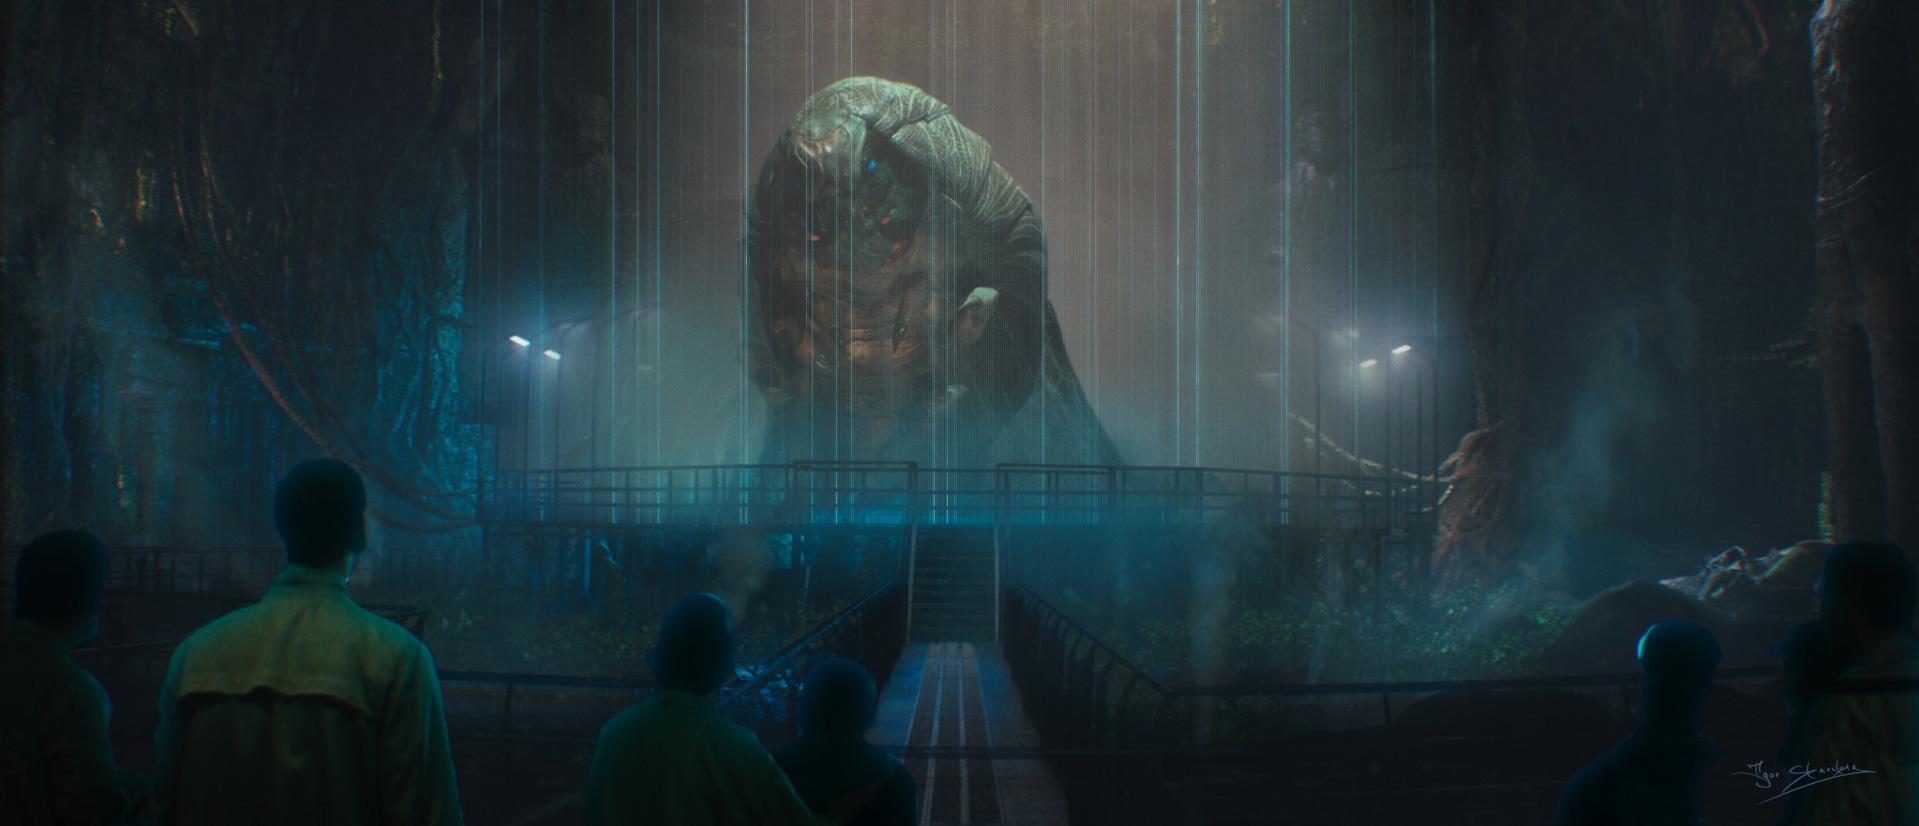 21.Godzilla8-ConceptArt.jpg